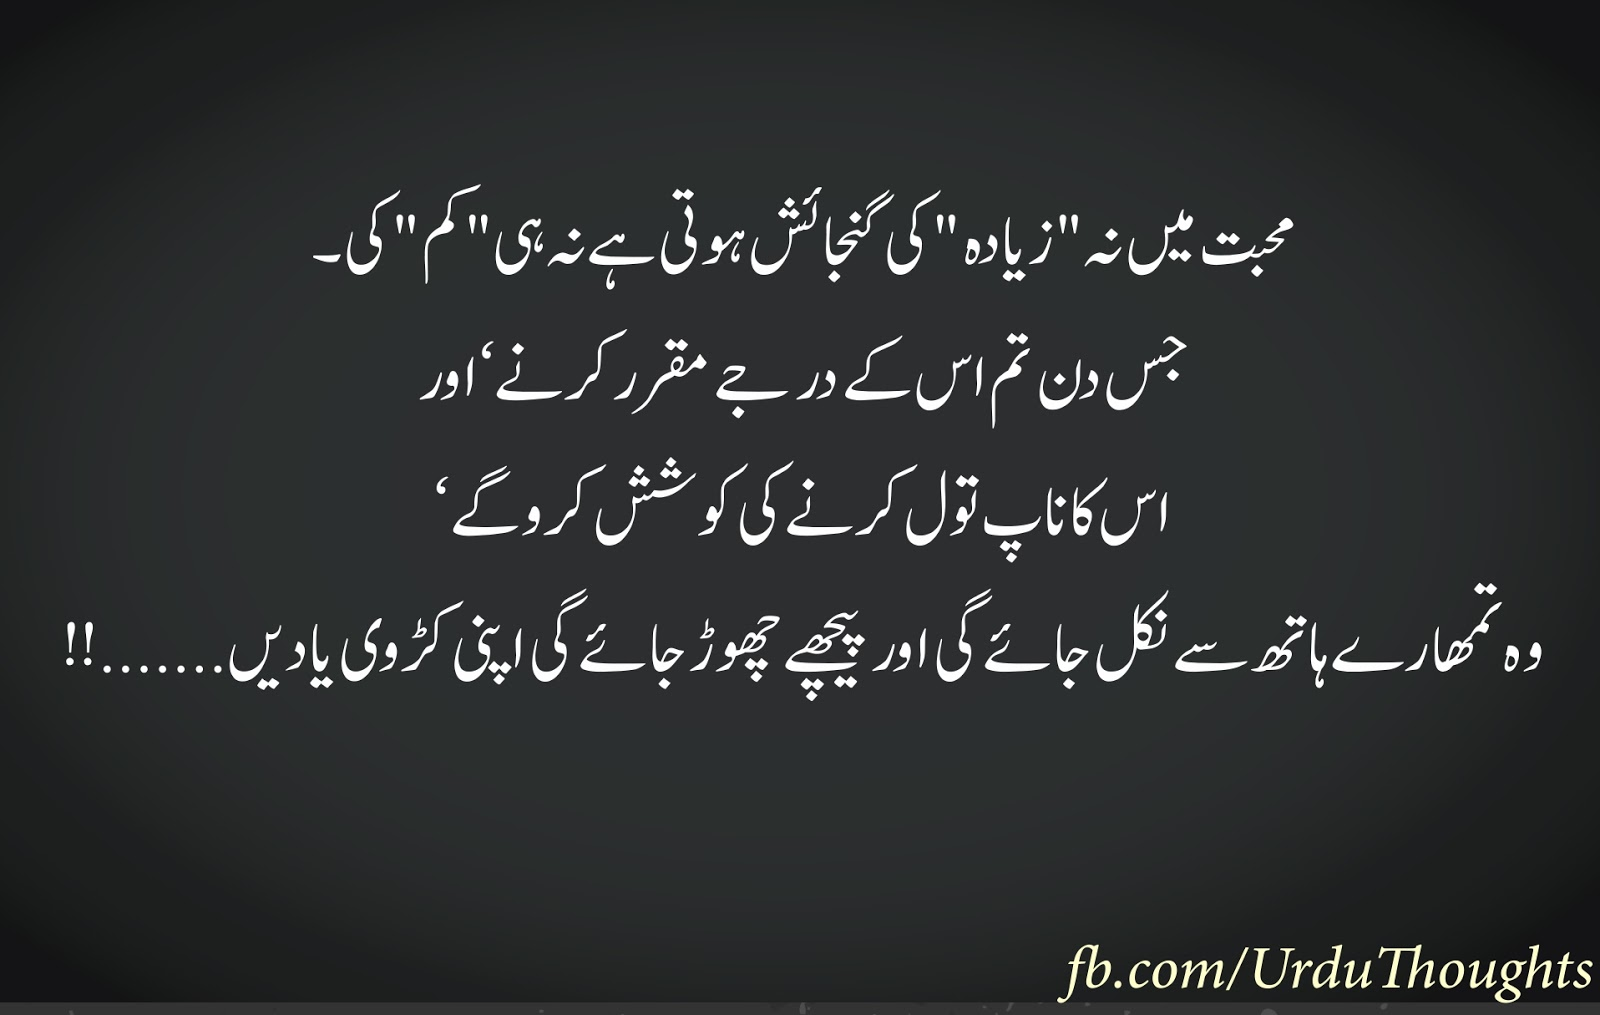 Iqtabas From Urdu Novels - Khoobsurat Iqtibas - Urdu Thoughts